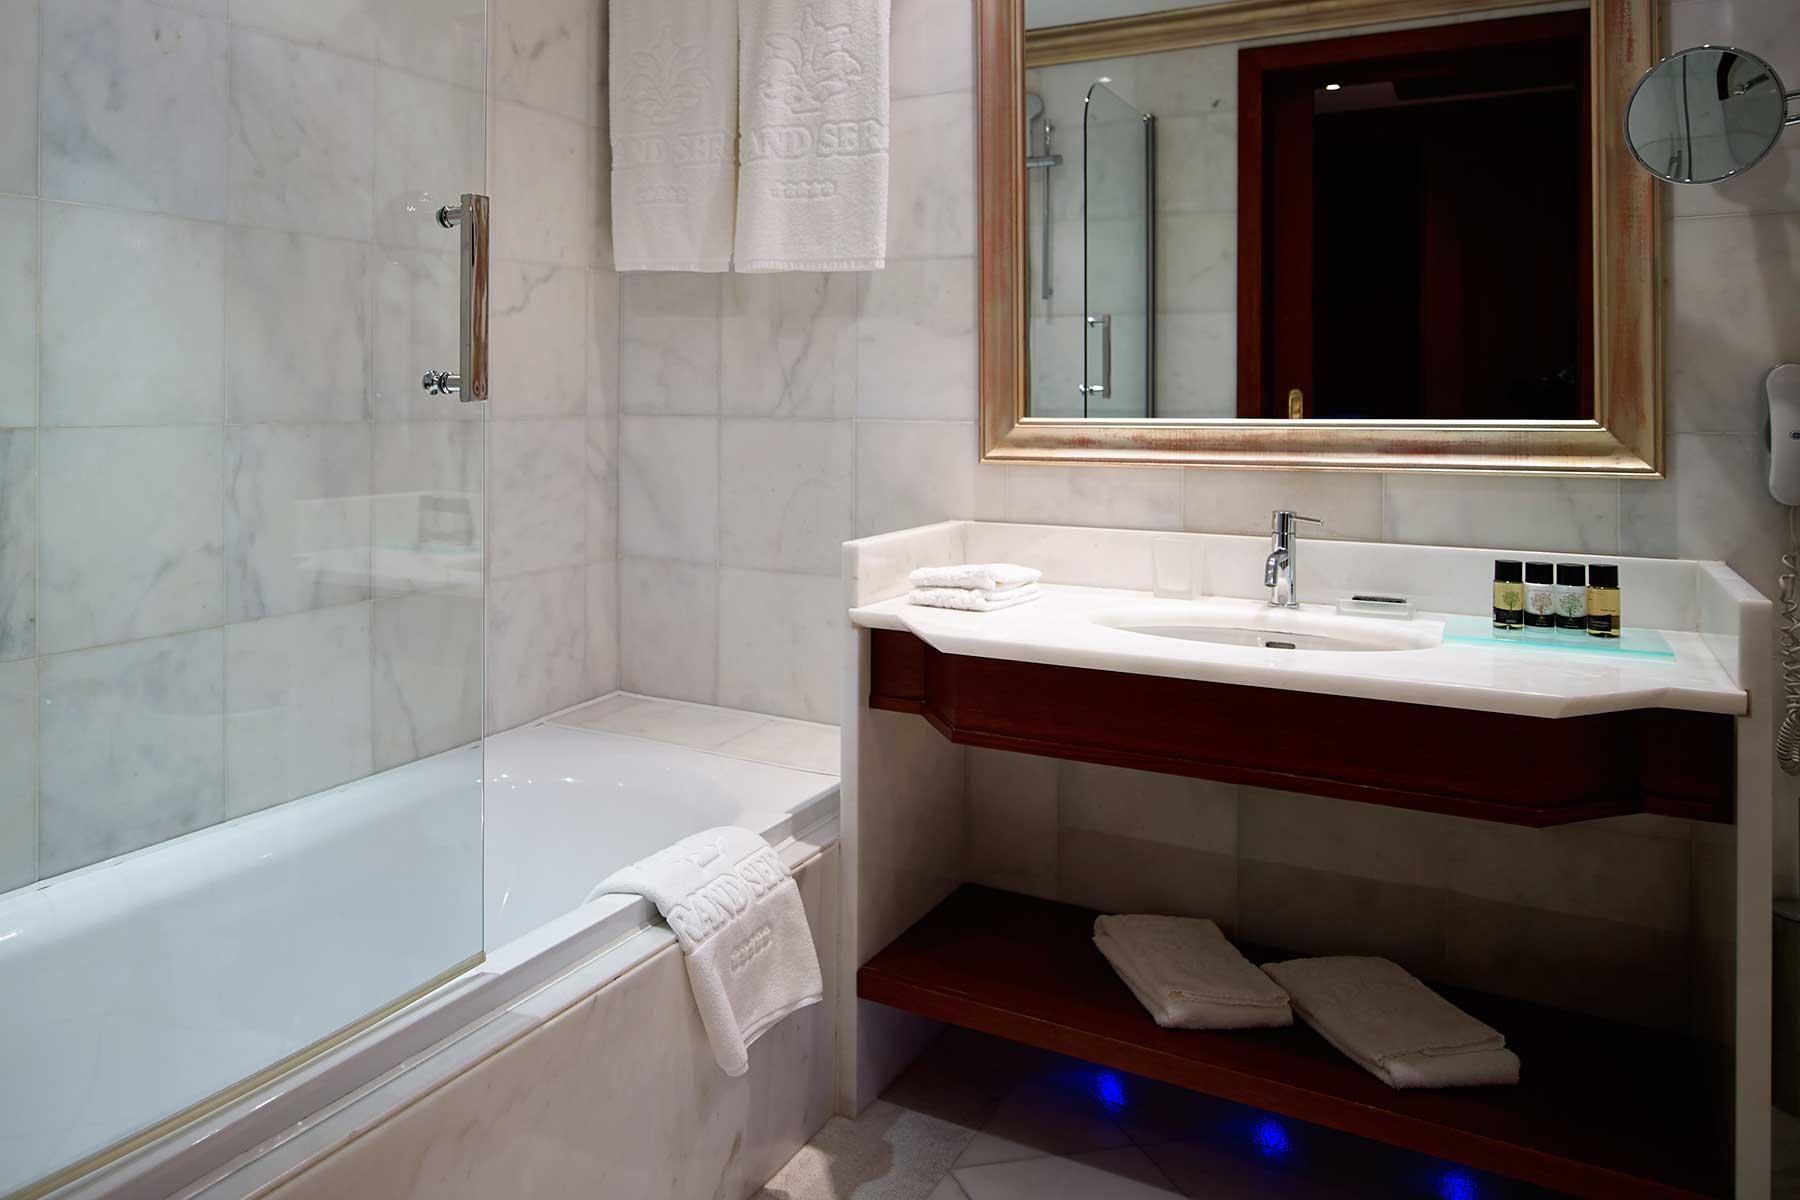 grand-serai-standart-double-room-ioannina-greece-7.jpg